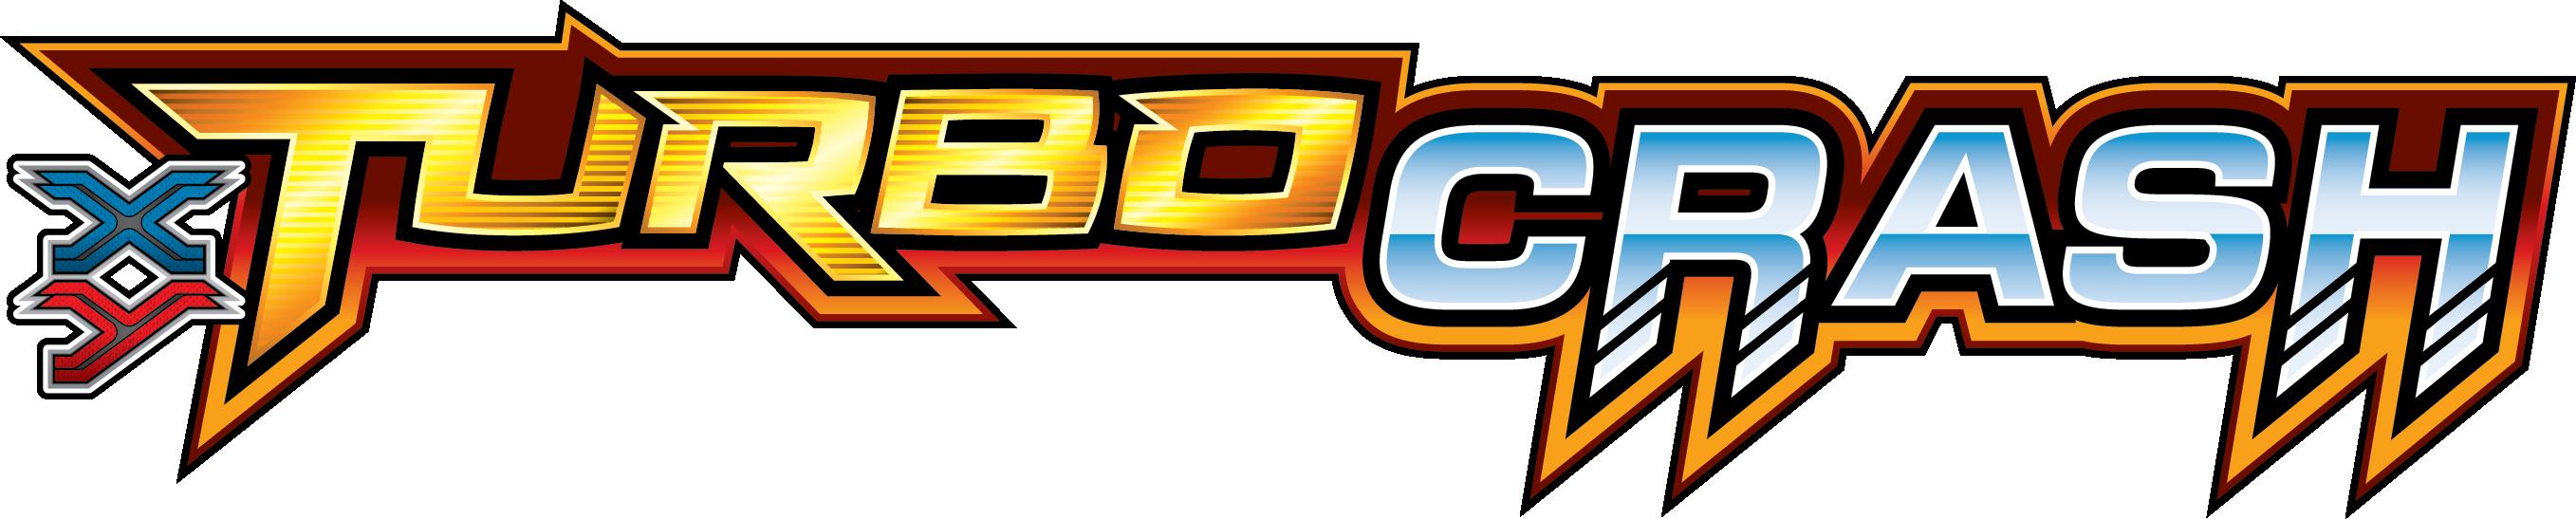 xy9_logo_it